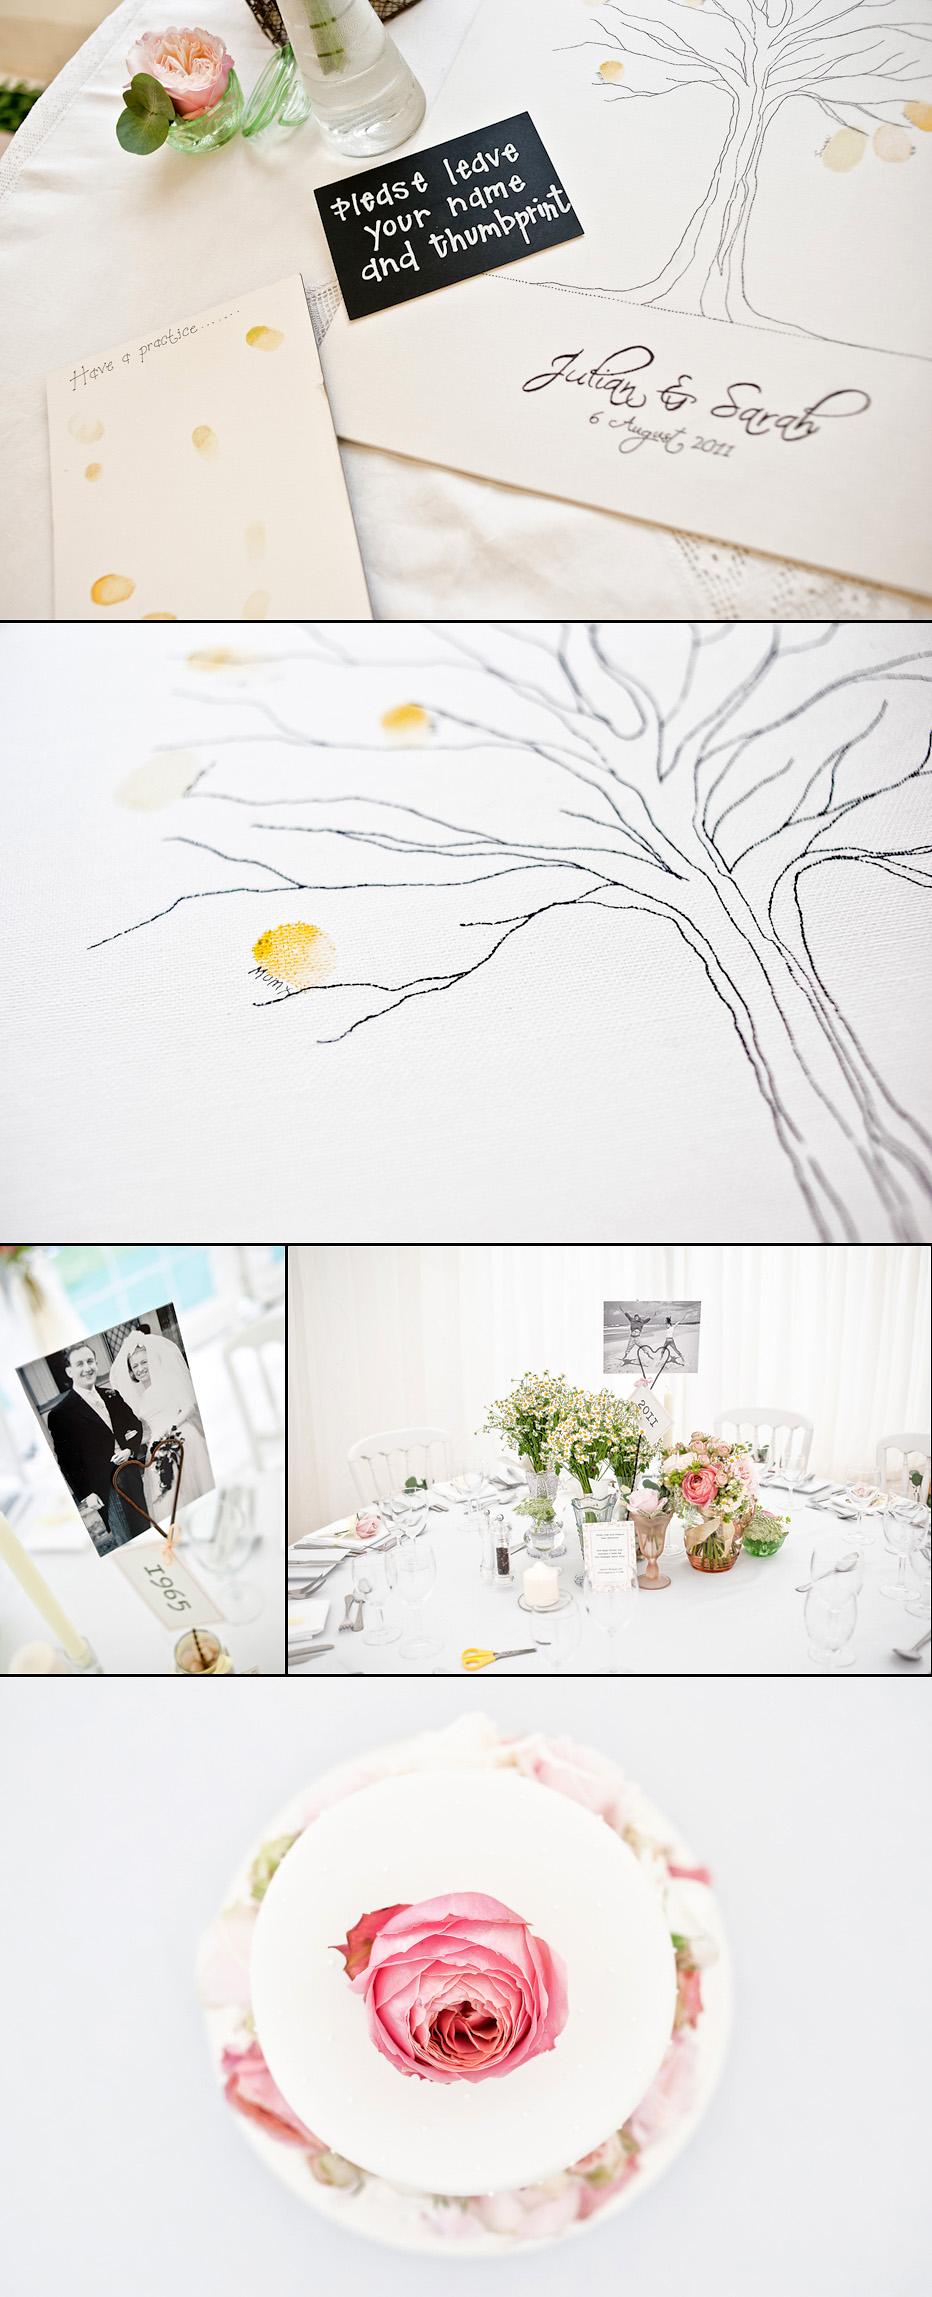 Wedding signing tree